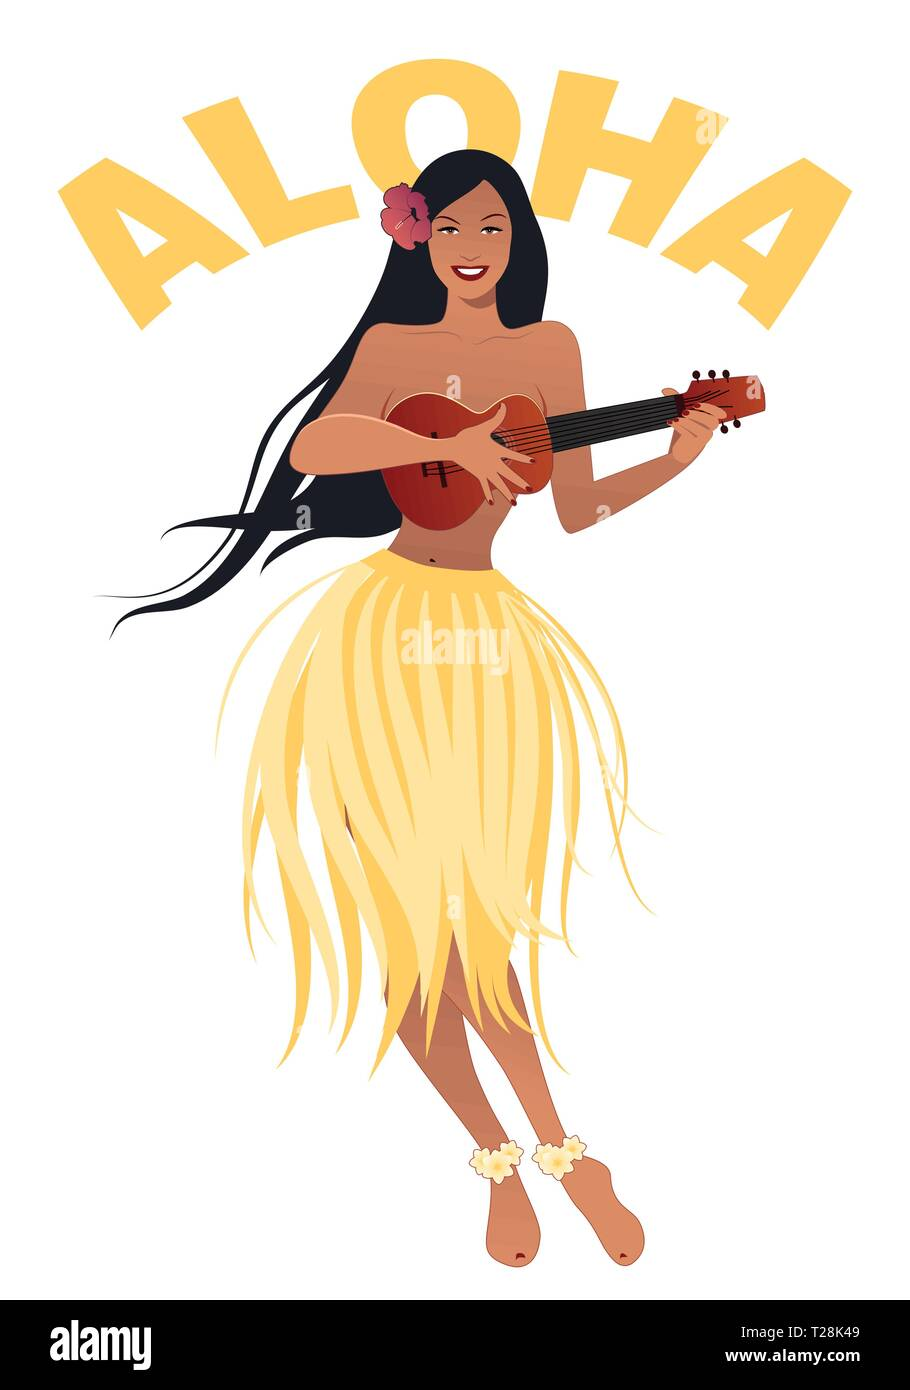 Beautiful and smiling Hawaiian girl wearing skirt of leaves playing ukulele isolated on white background. Retro style - Stock Vector